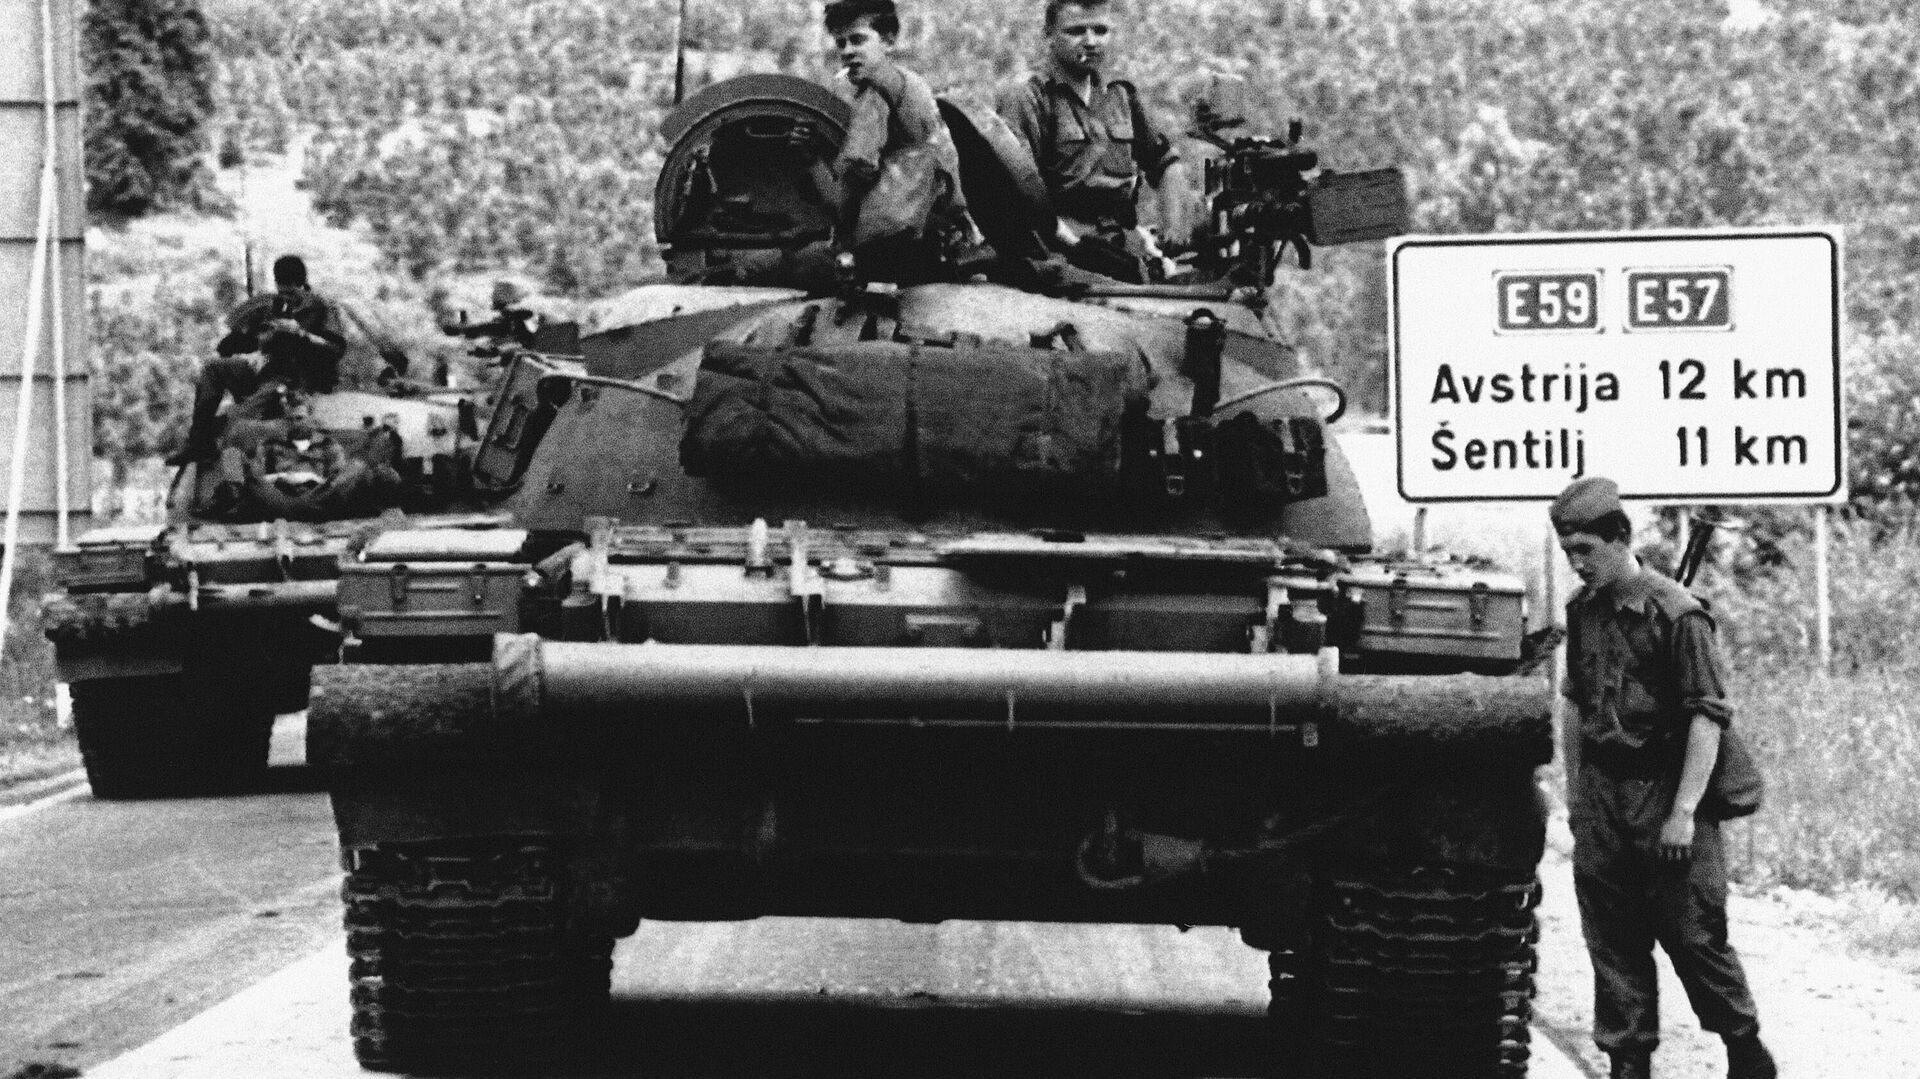 Tanques de Yugoslavia en 1991 (archivo) - Sputnik Mundo, 1920, 08.07.2021